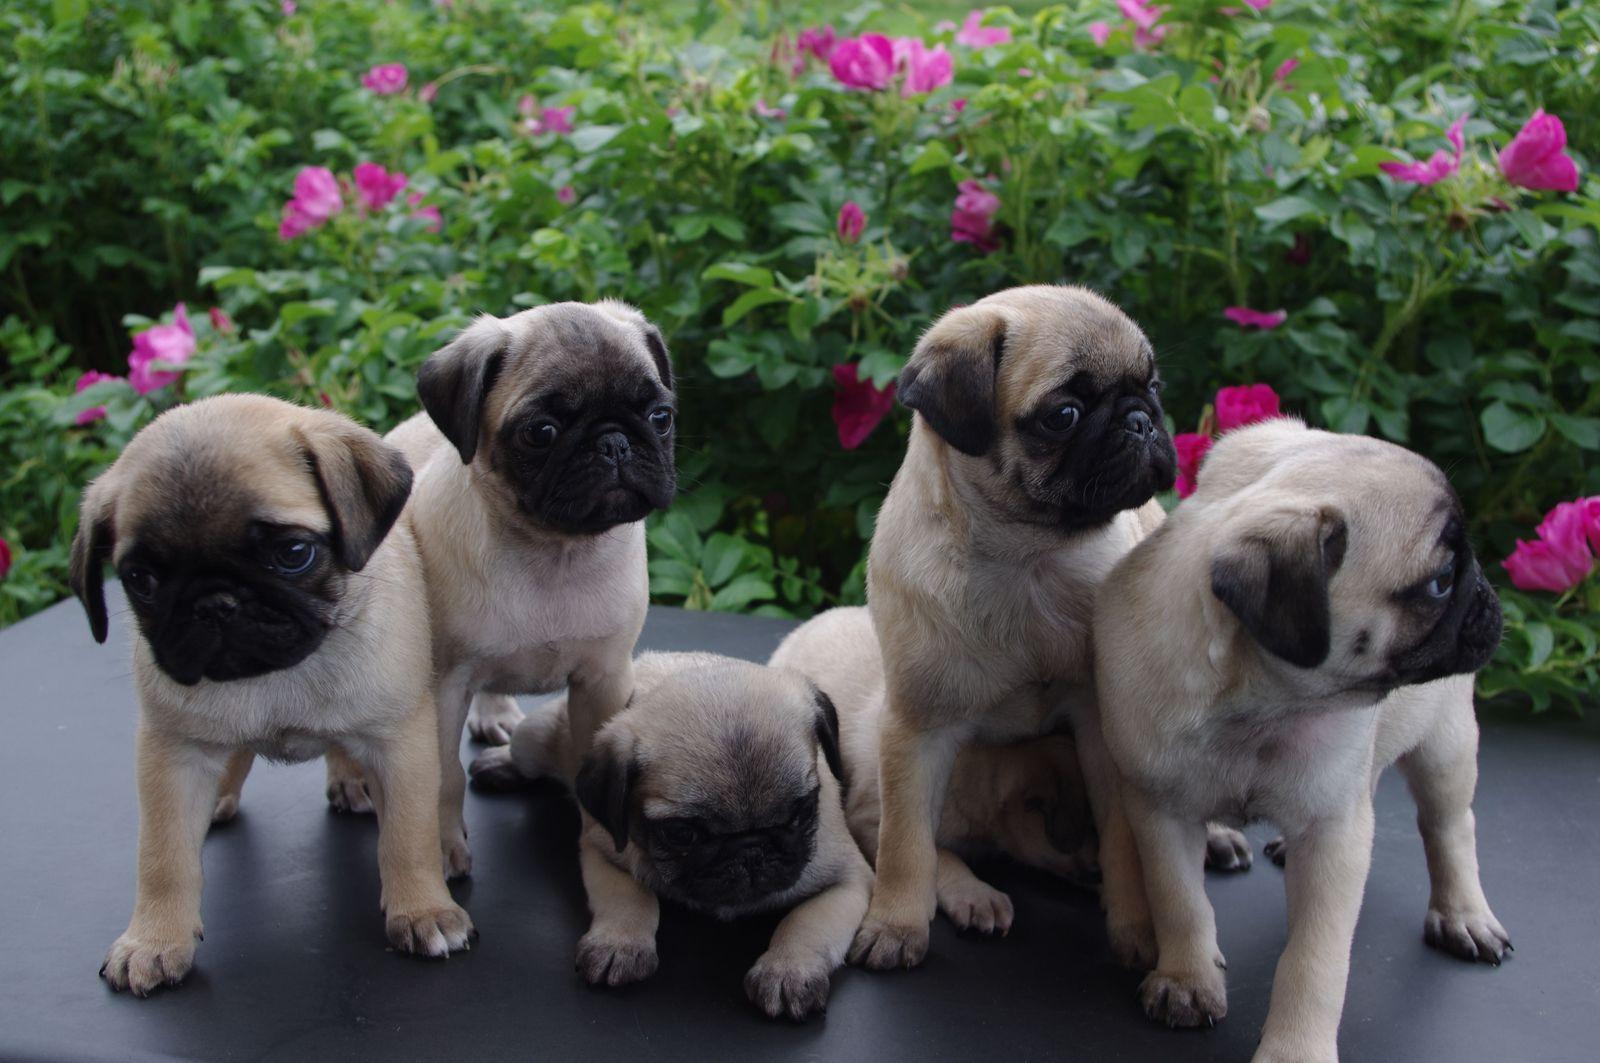 Pug Wallpaper Screensaver Background Cute Pug Puppies